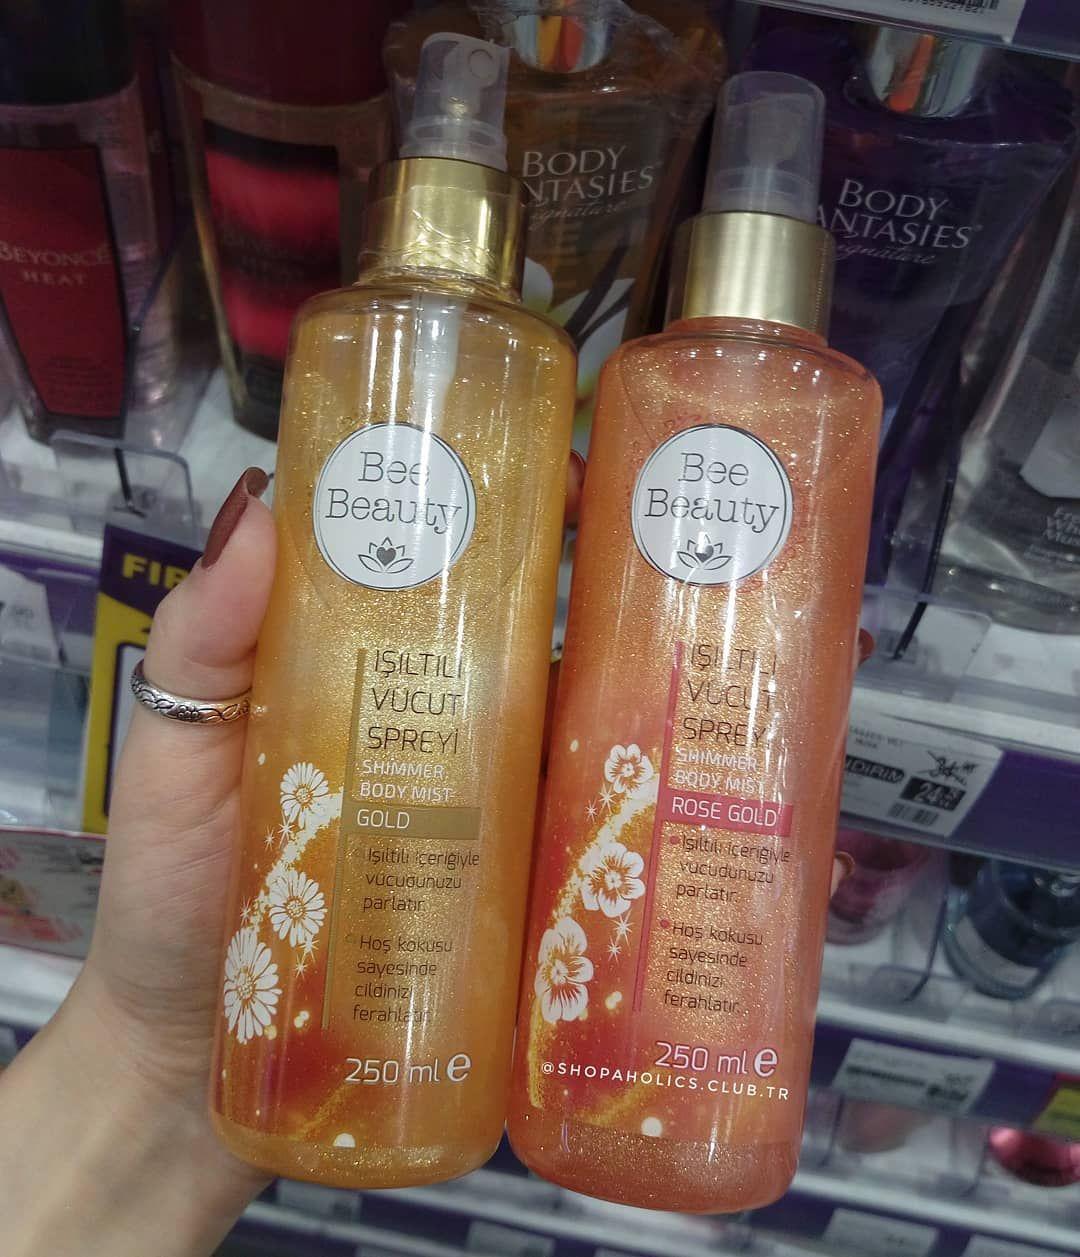 Isiltili Vucut Spreyi Gold Rose Gold Fiyati 12 90tl Gratis Paylasimlarim Gratissc Gratistr Vucut Spreyi Yeni Baslayanlar Makyaj Parfum Koleksiyonu